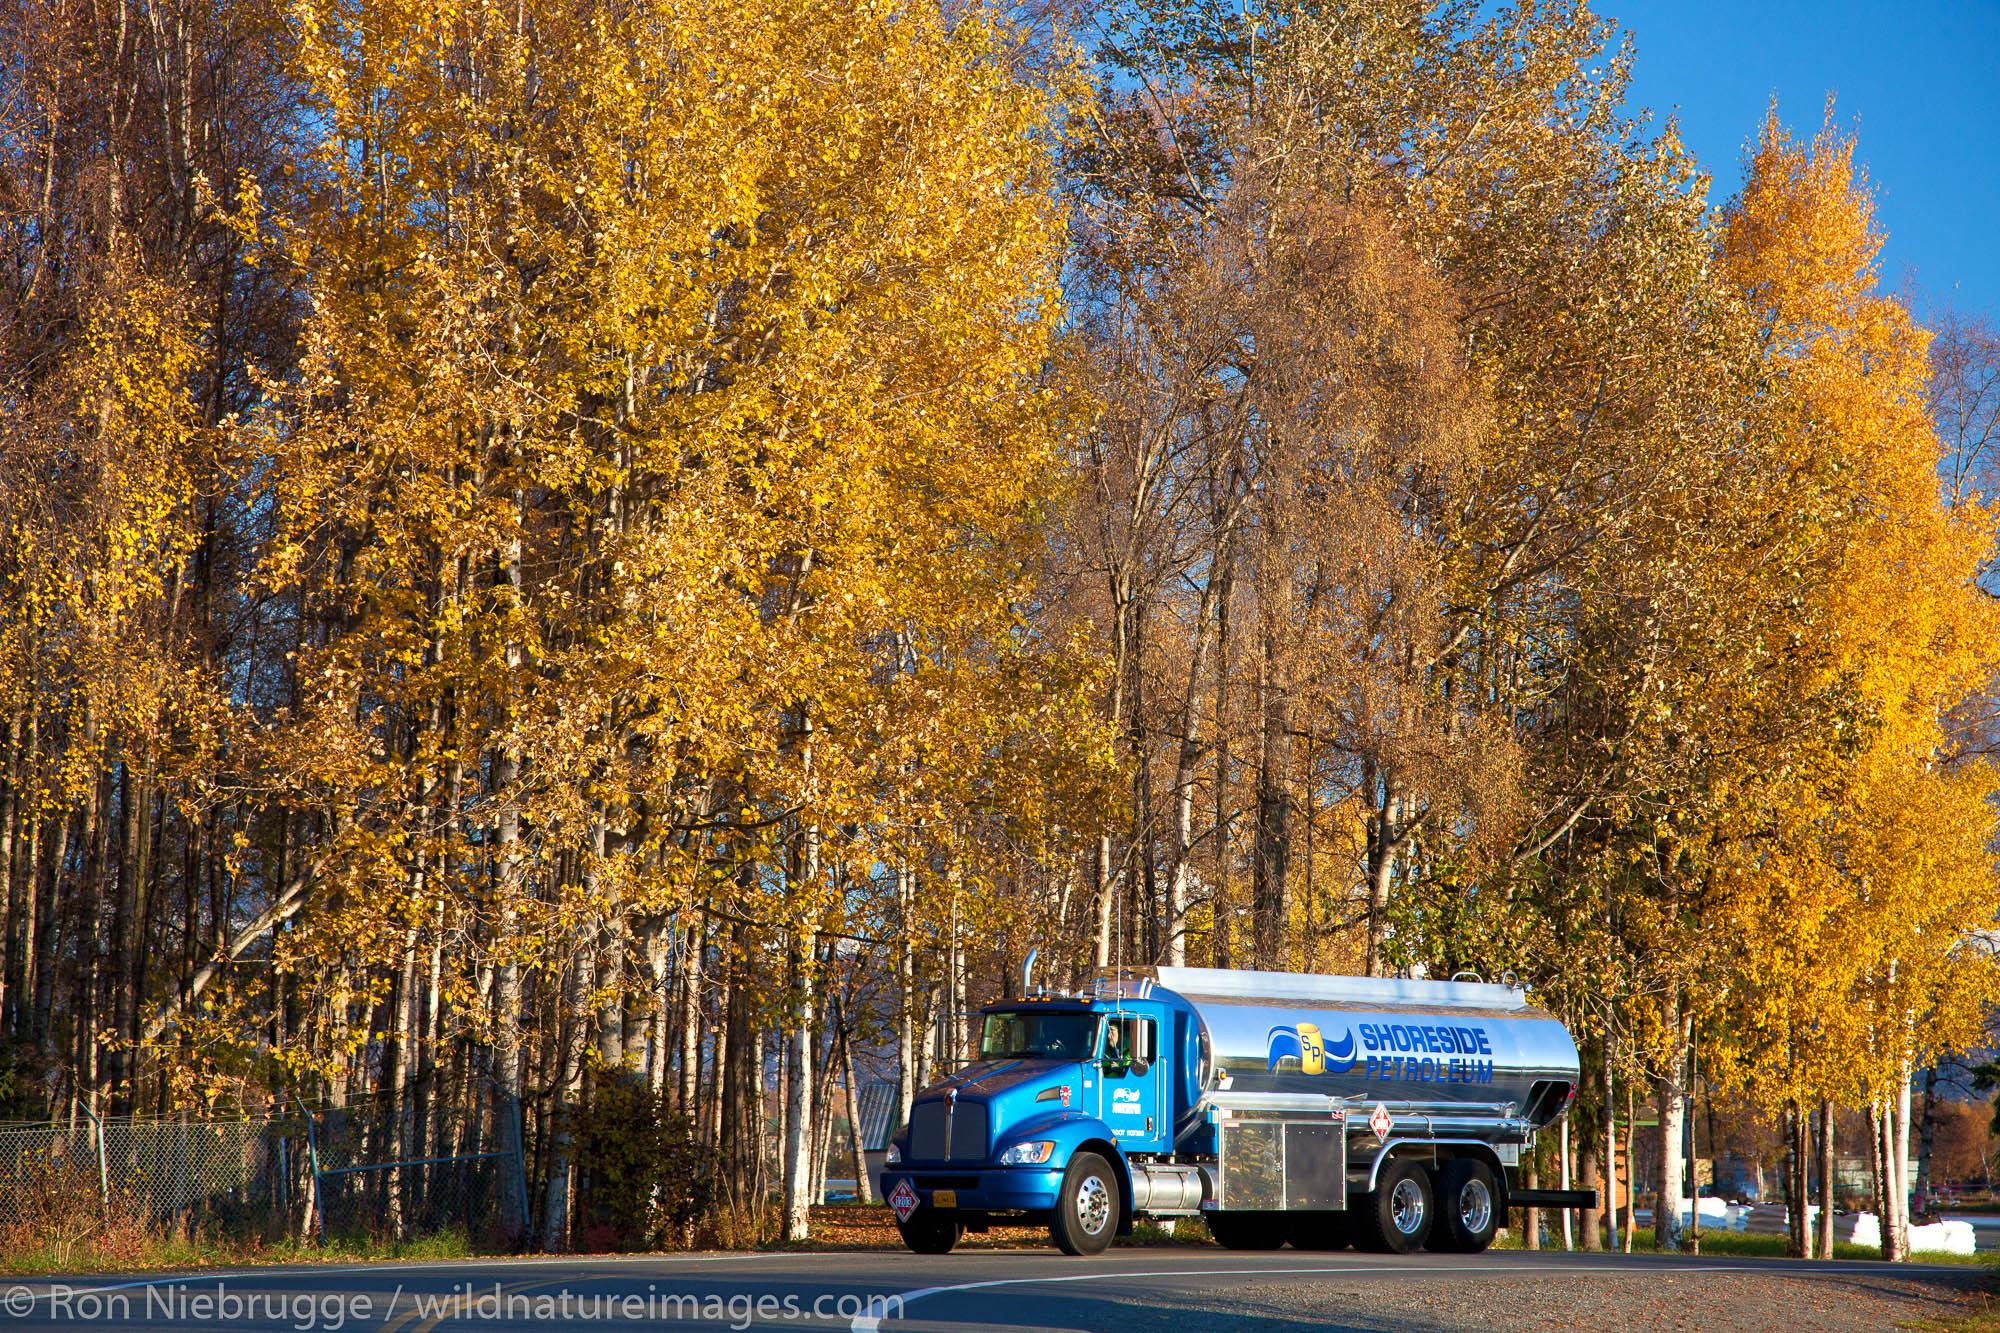 Shoreside Petroleum Anchorage Fuel Truck Shoot, October 10, 2011.